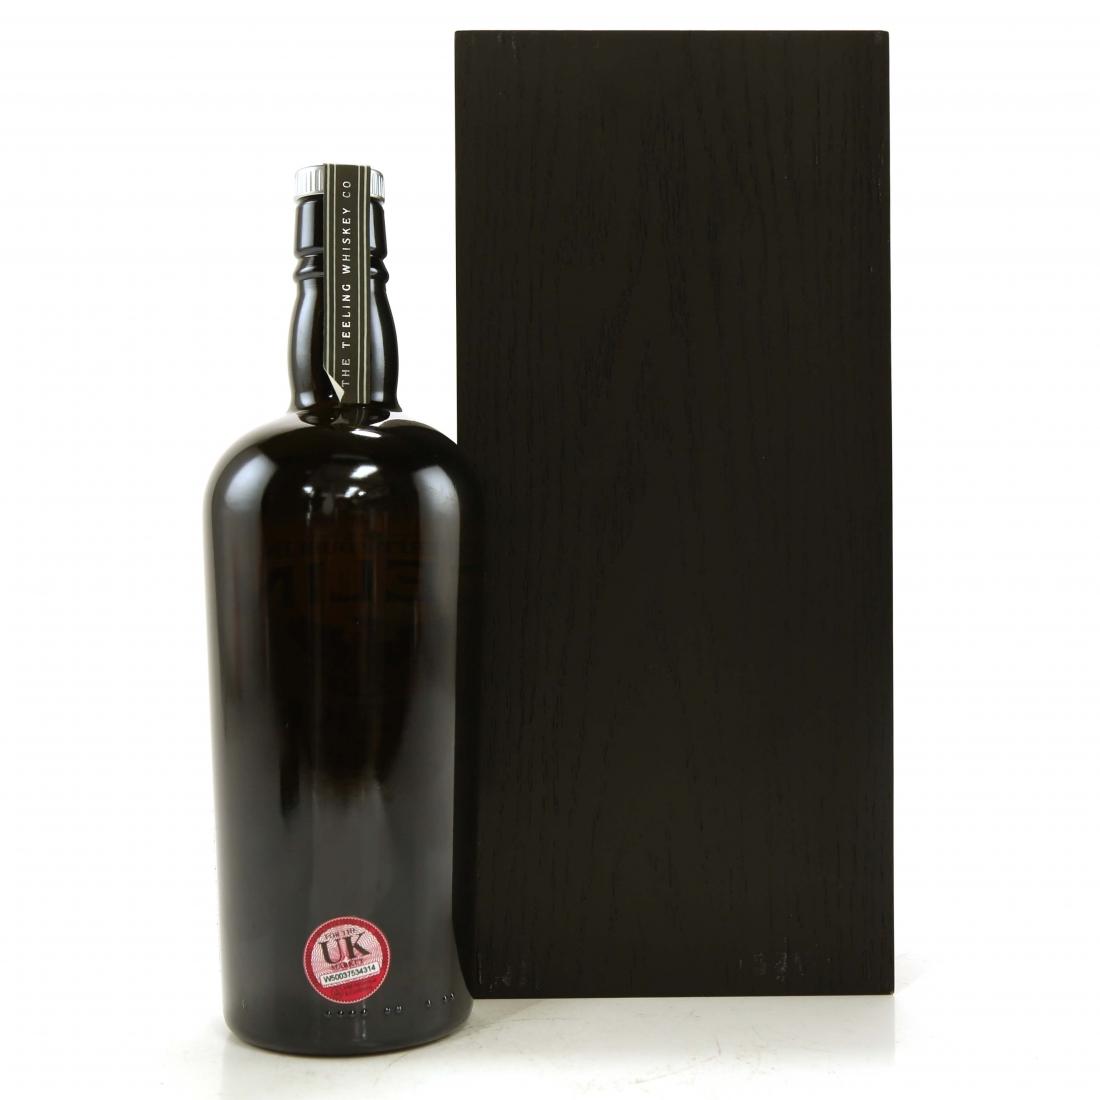 Teeling Celebratory Single Pot Still Whiskey / Bottle #075